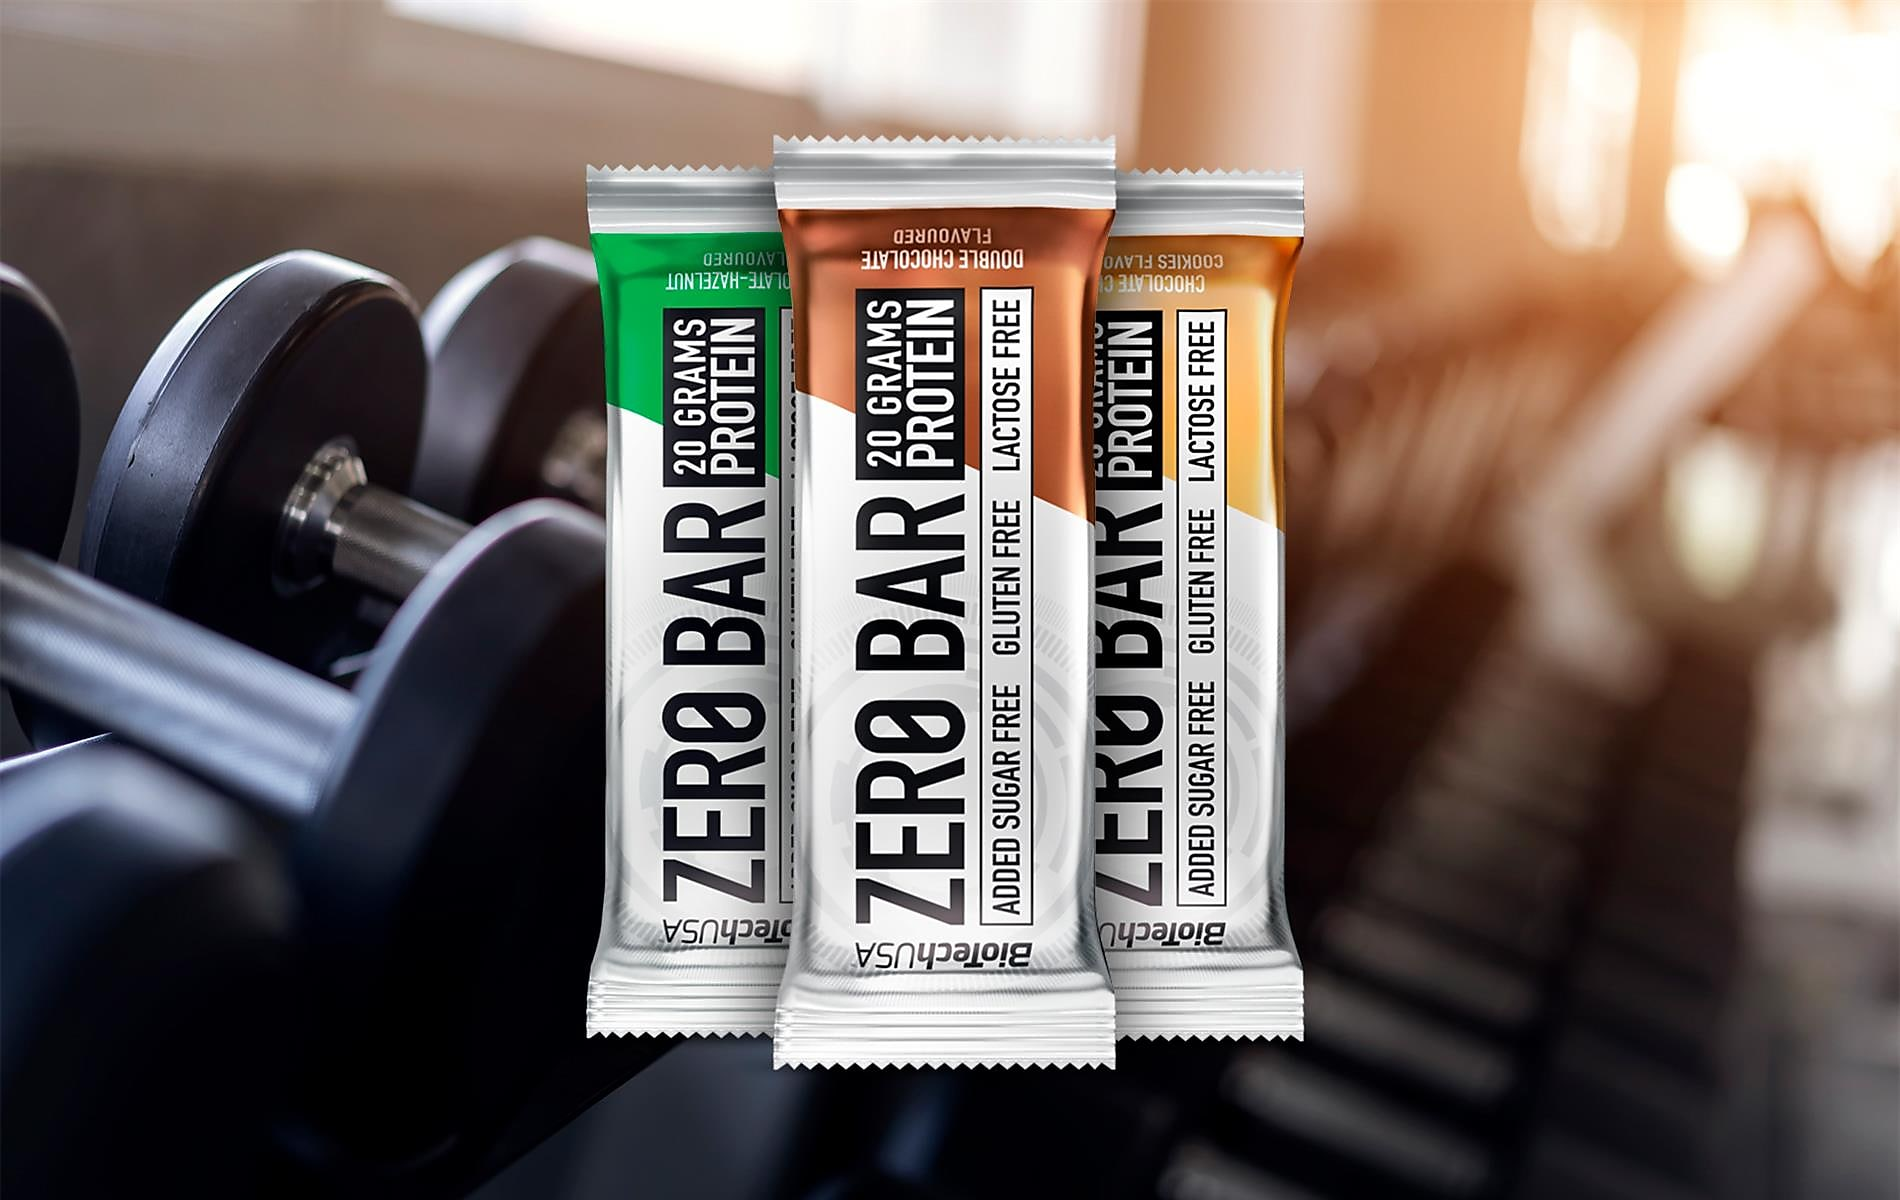 10 pont Zero Bar protein szelettel!